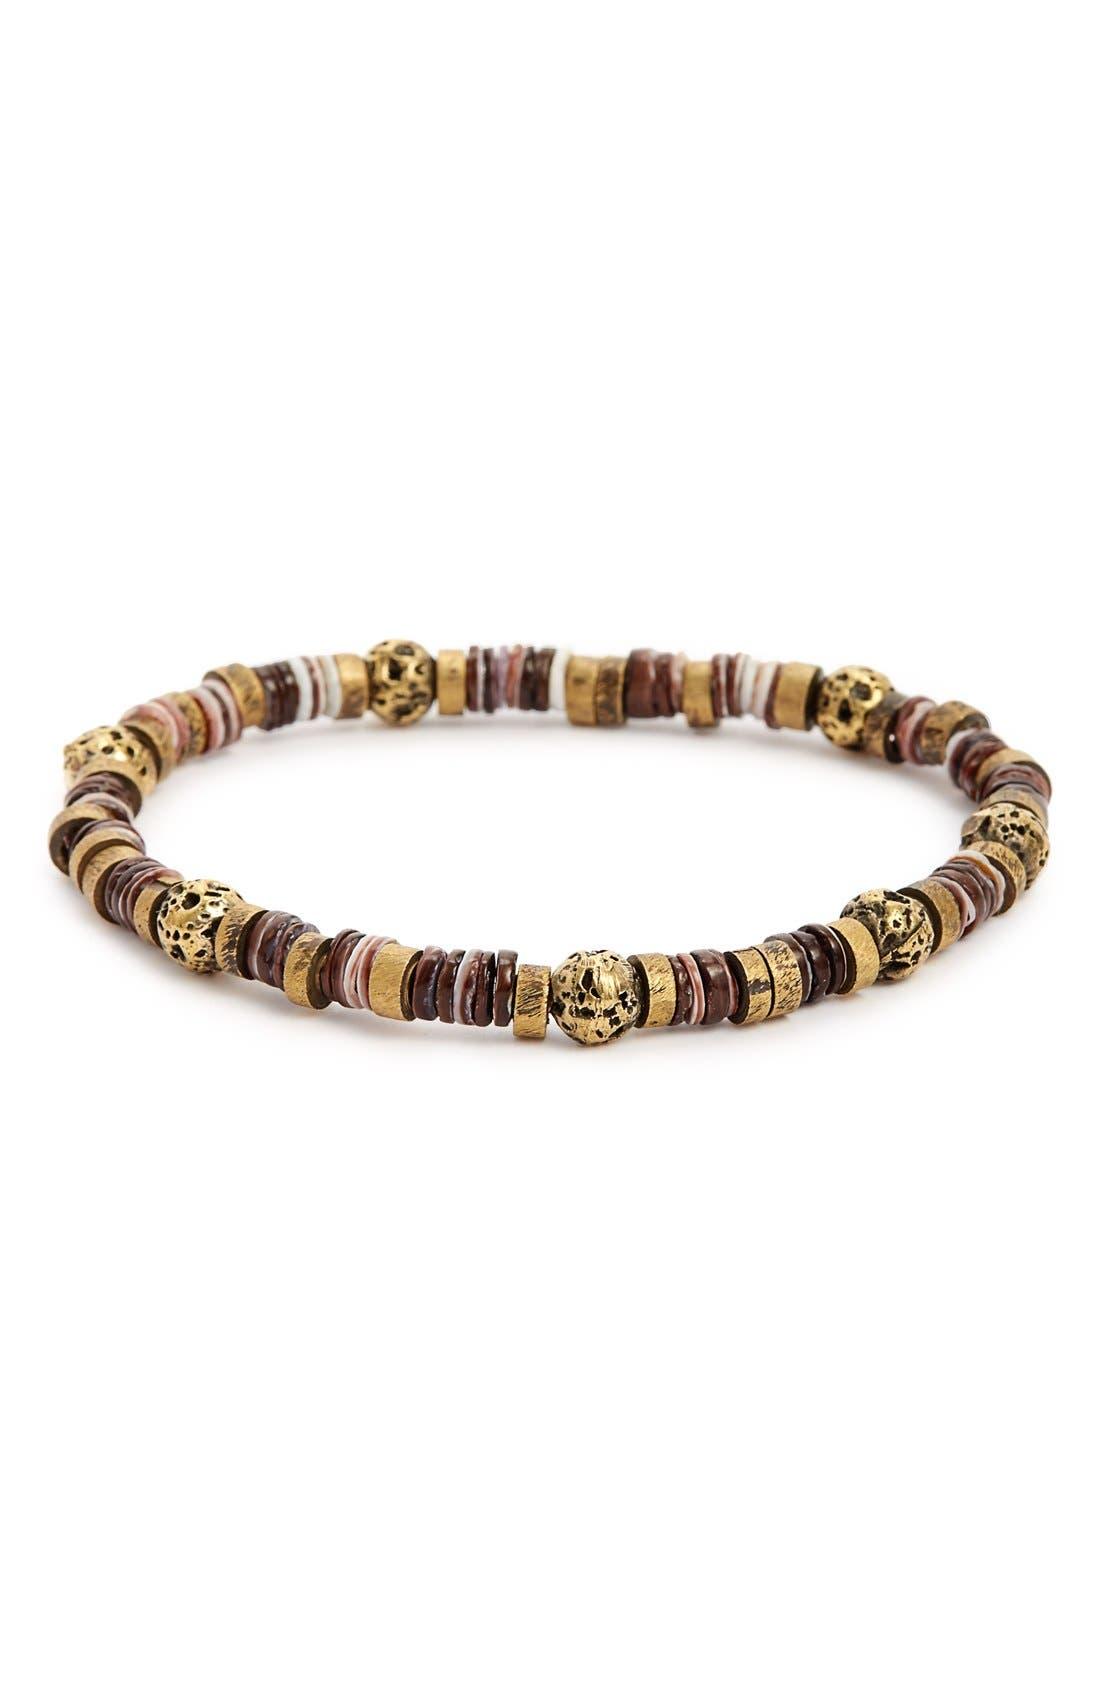 Main Image - LINK UP Lava Rock & Brass Bead Bracelet